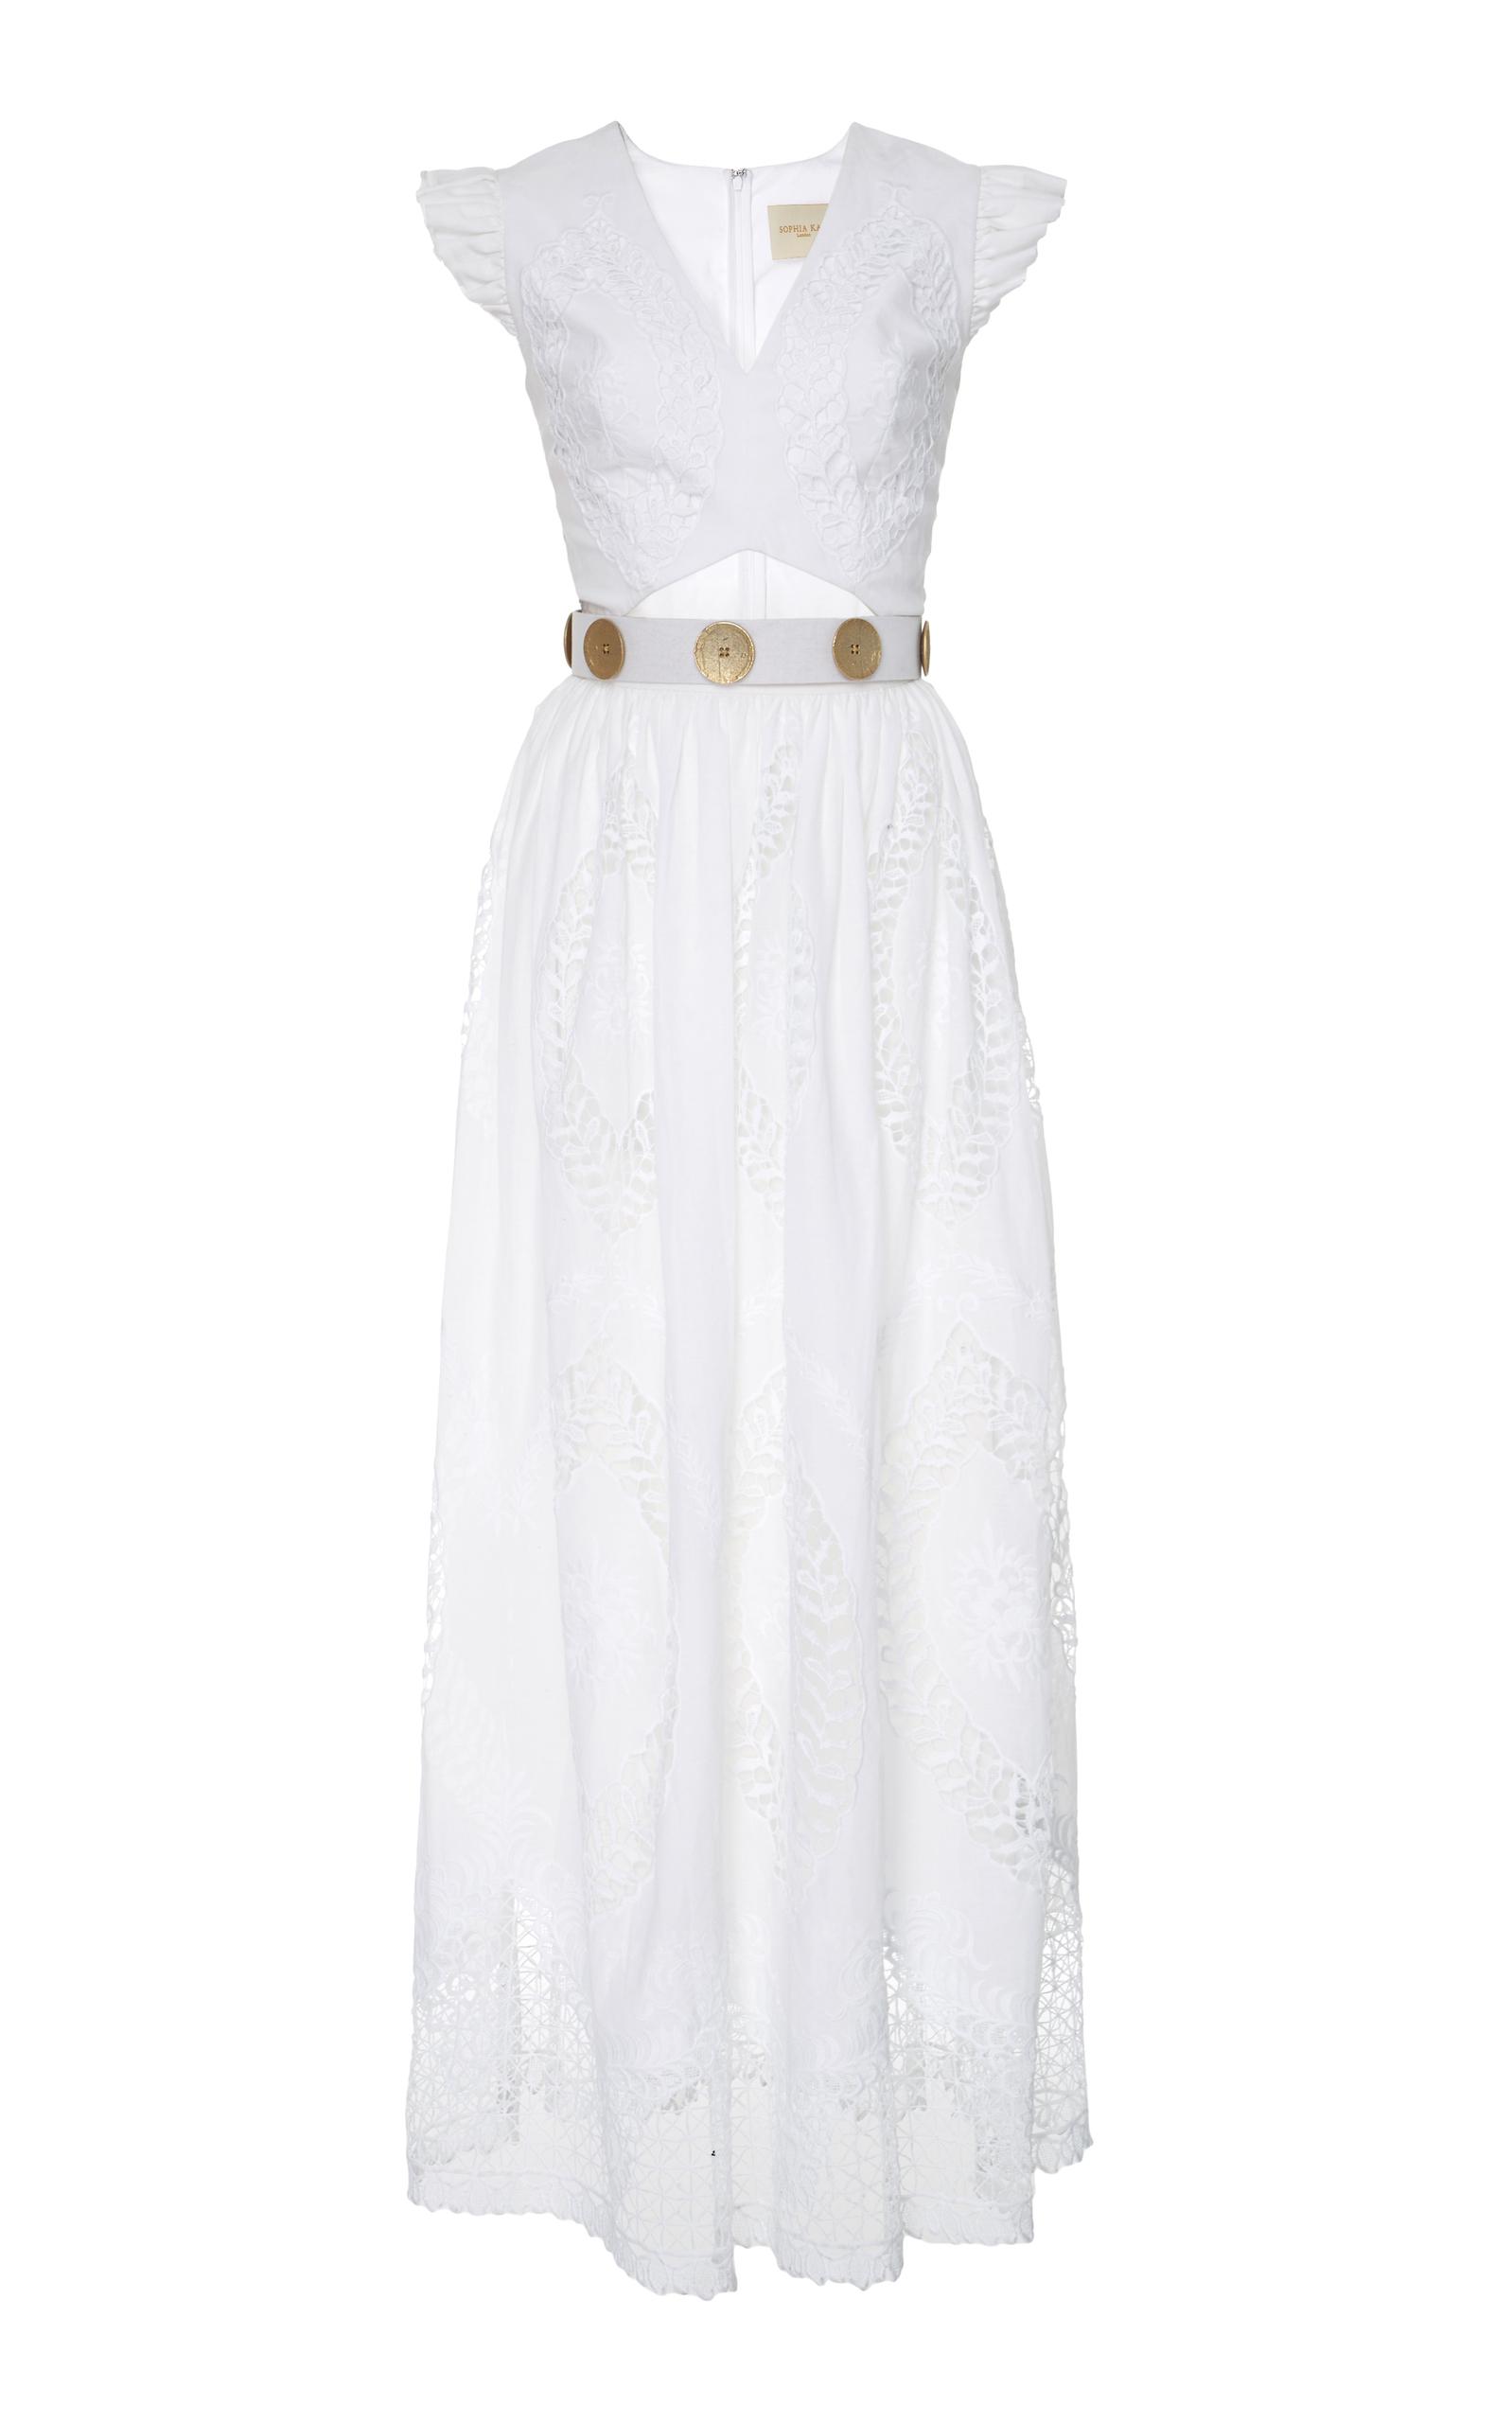 b22ec38fdbe Maria Clara Lace A Line Dress By Sophia Kah Moda Operandi